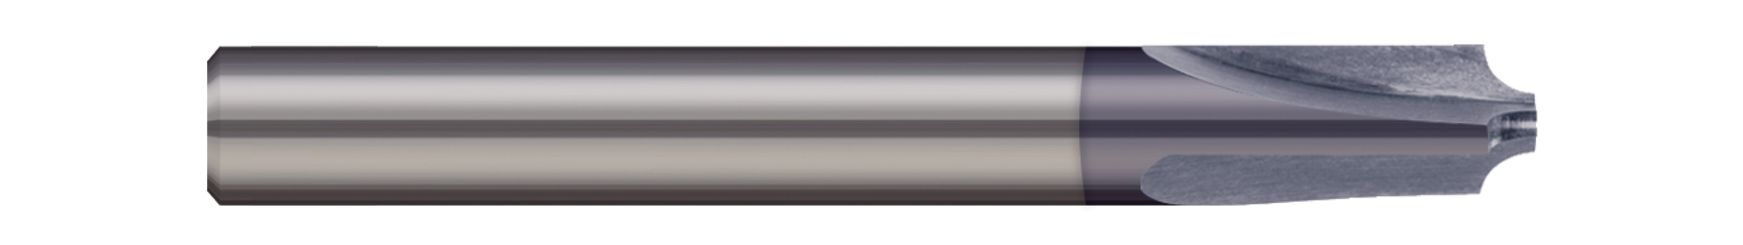 tool-details-CREM-080-300X